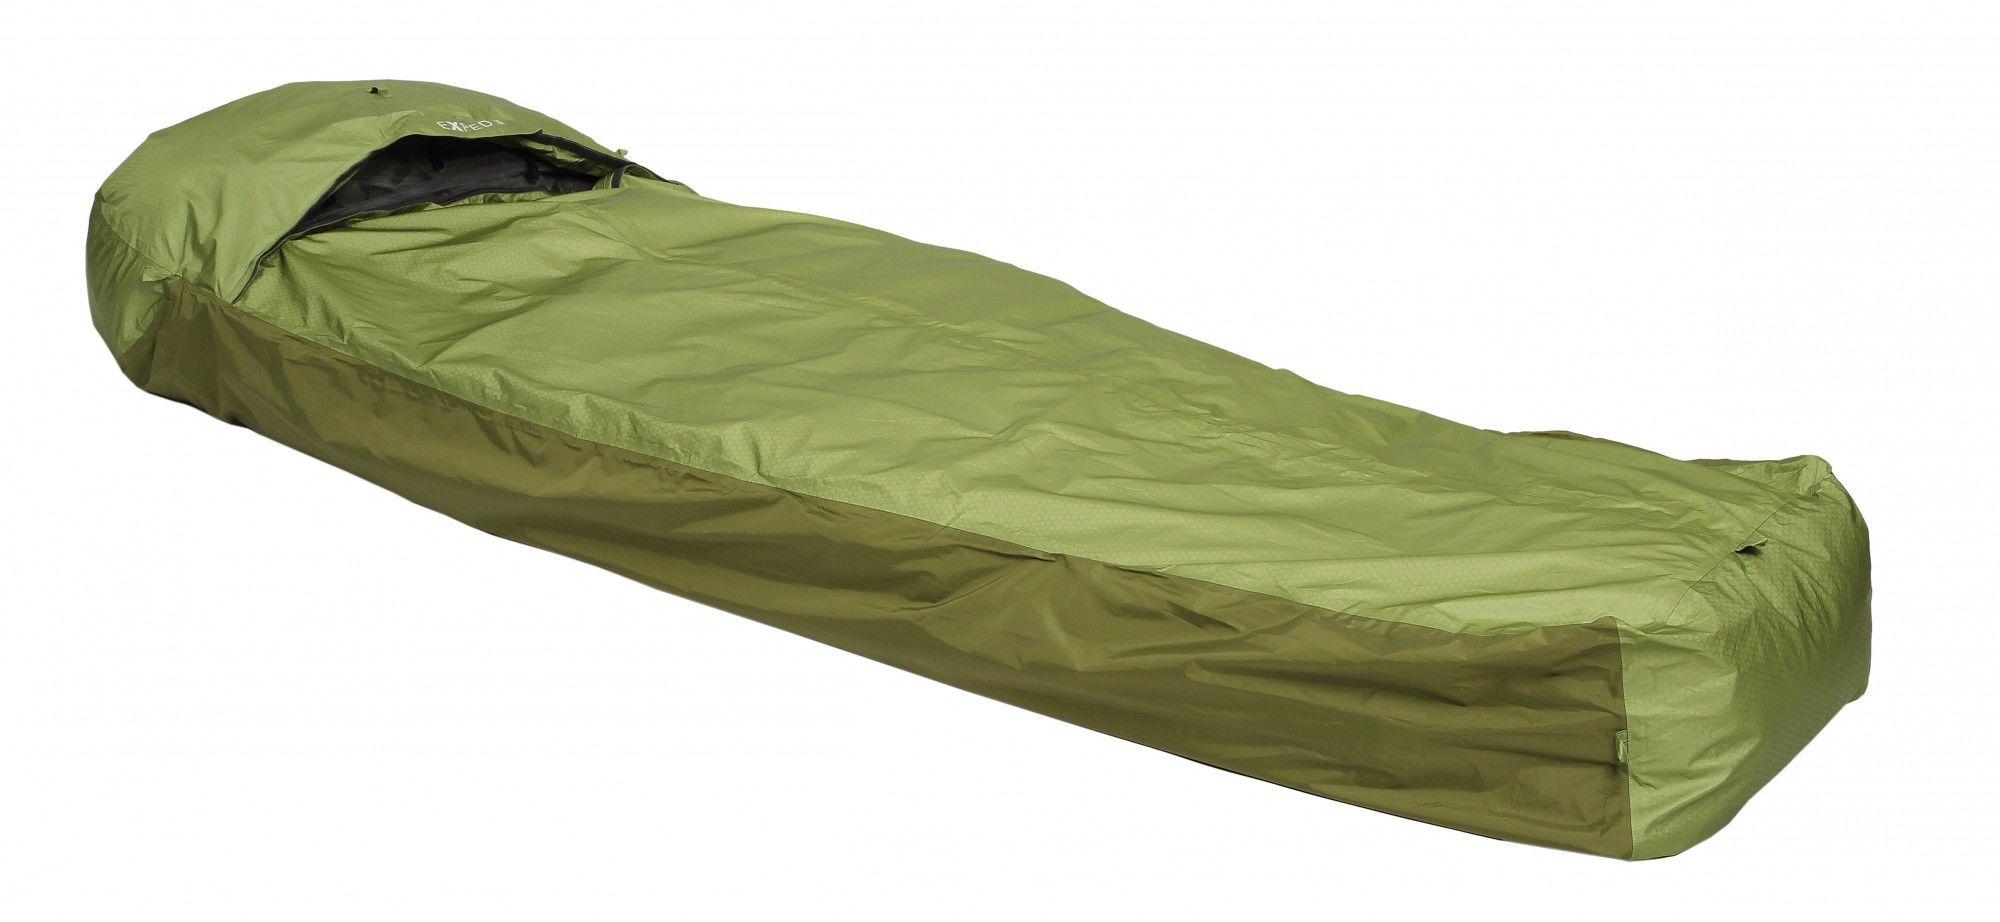 Exped Bivybag Ventair/PU, Green | Größe 240 cm |  Biwaksack